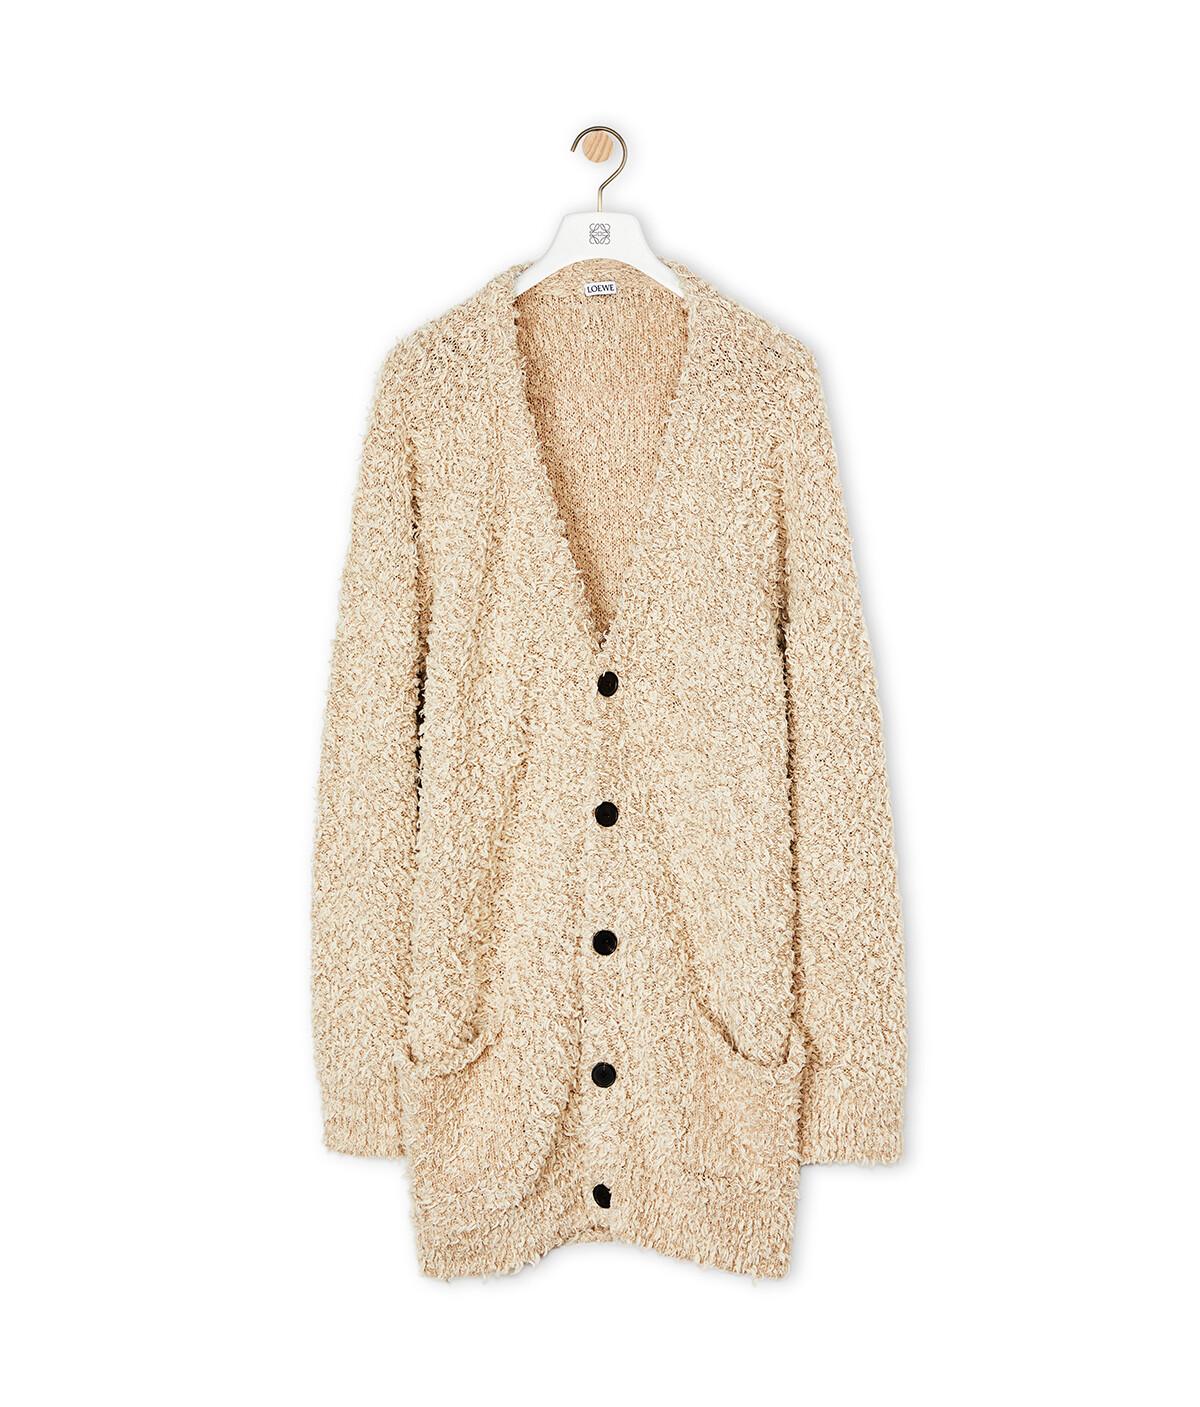 LOEWE Knit Oversize Cardigan Beige front